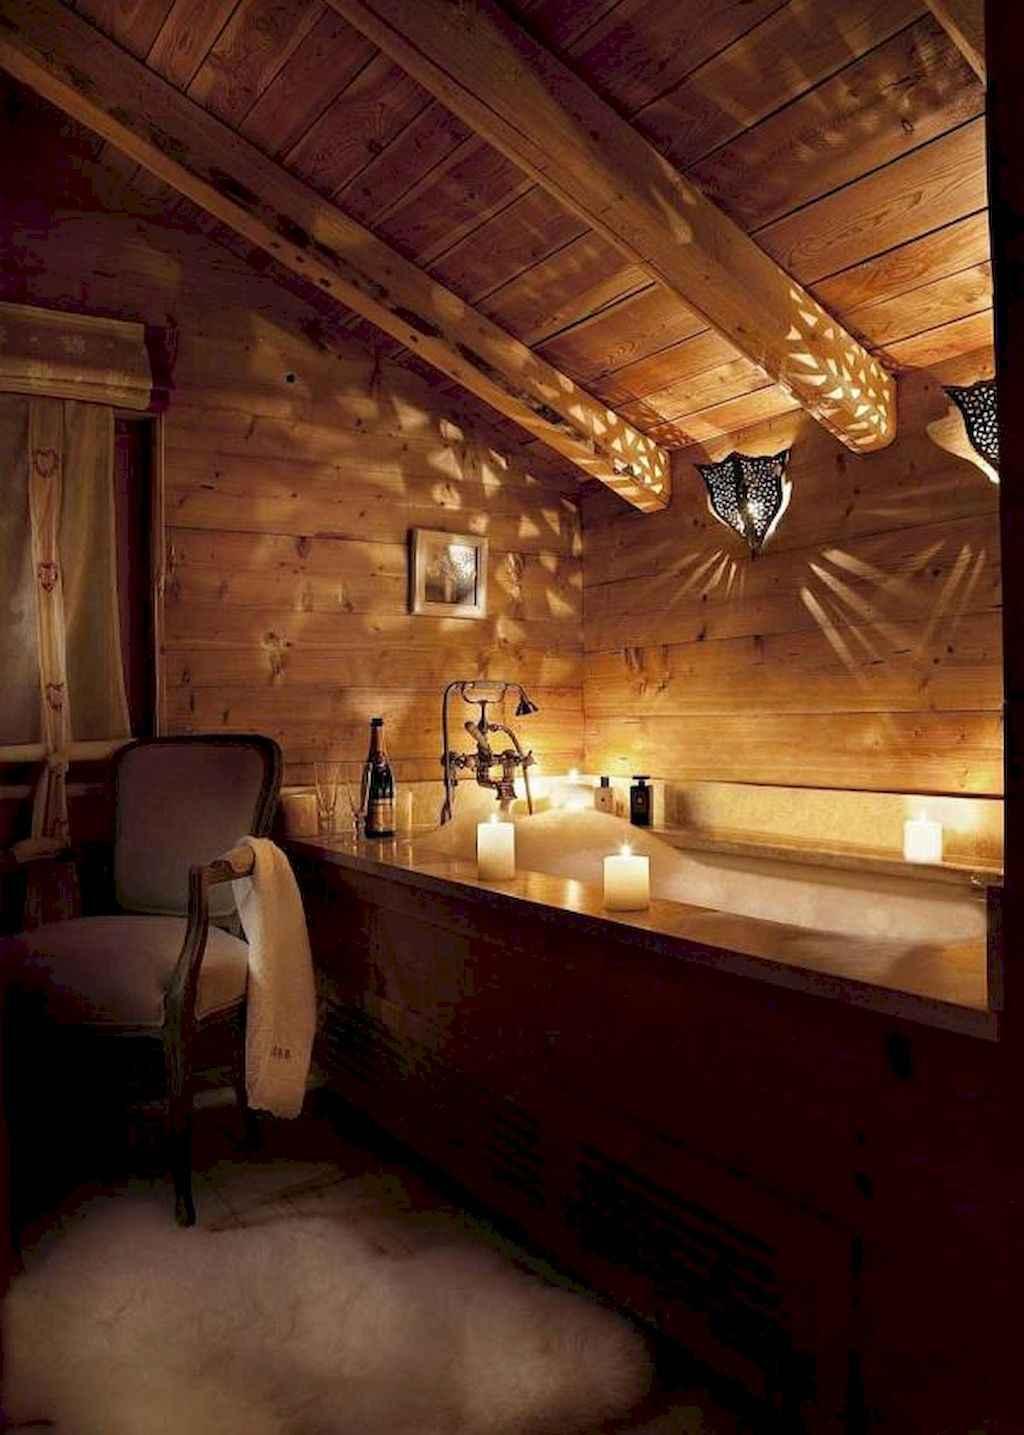 Inspiring rustic bathroom decor ideas (3)